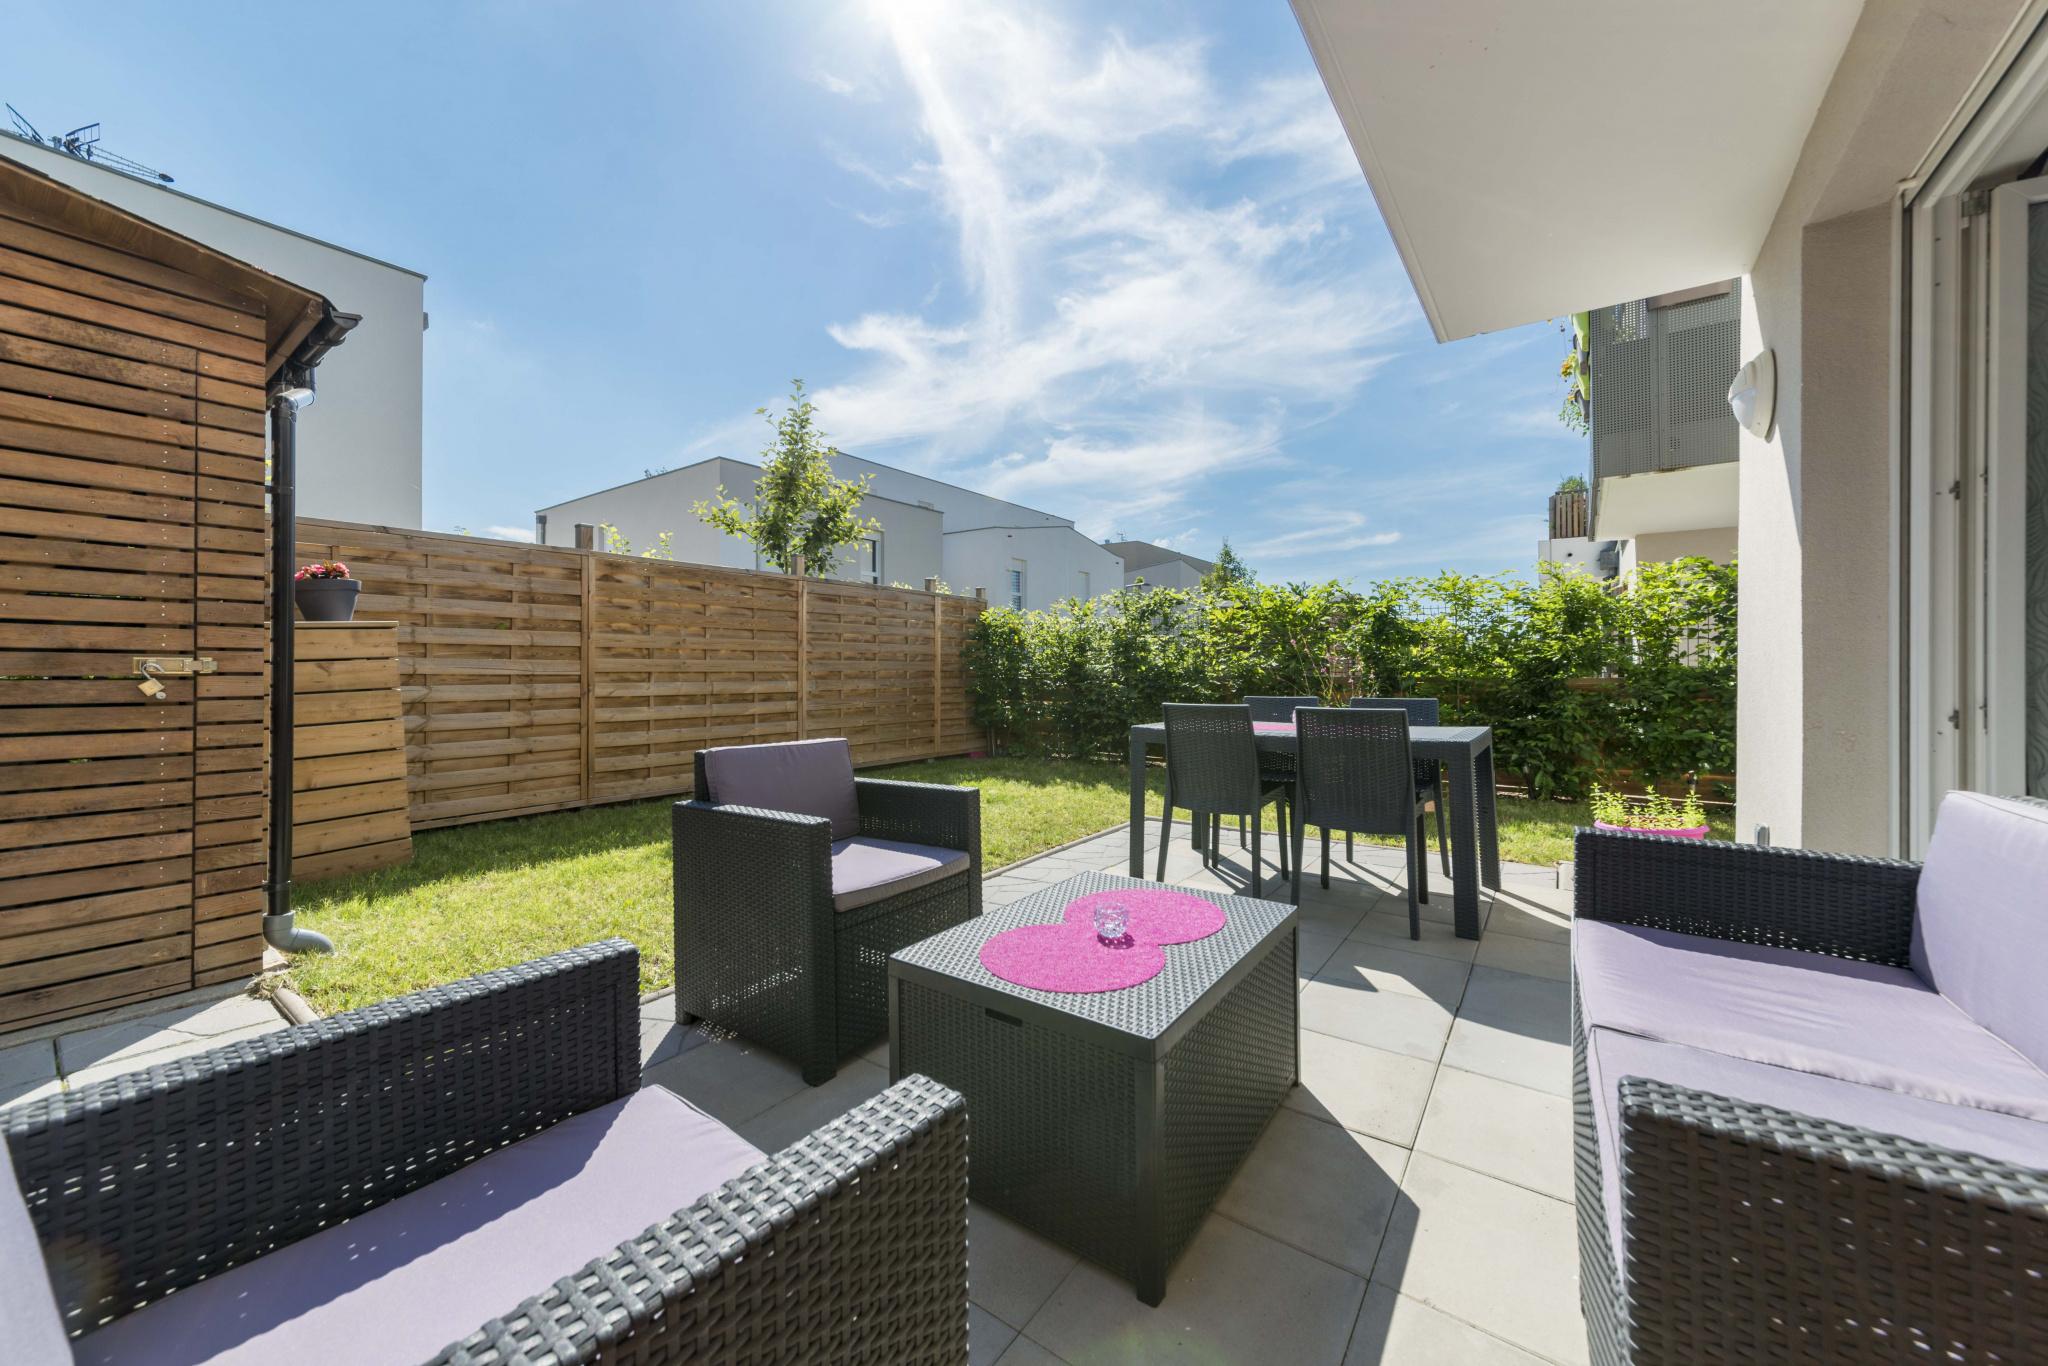 STRASBOURG STOCKFELD - 3p de 64m2 avec jardin de 58m2 et garage